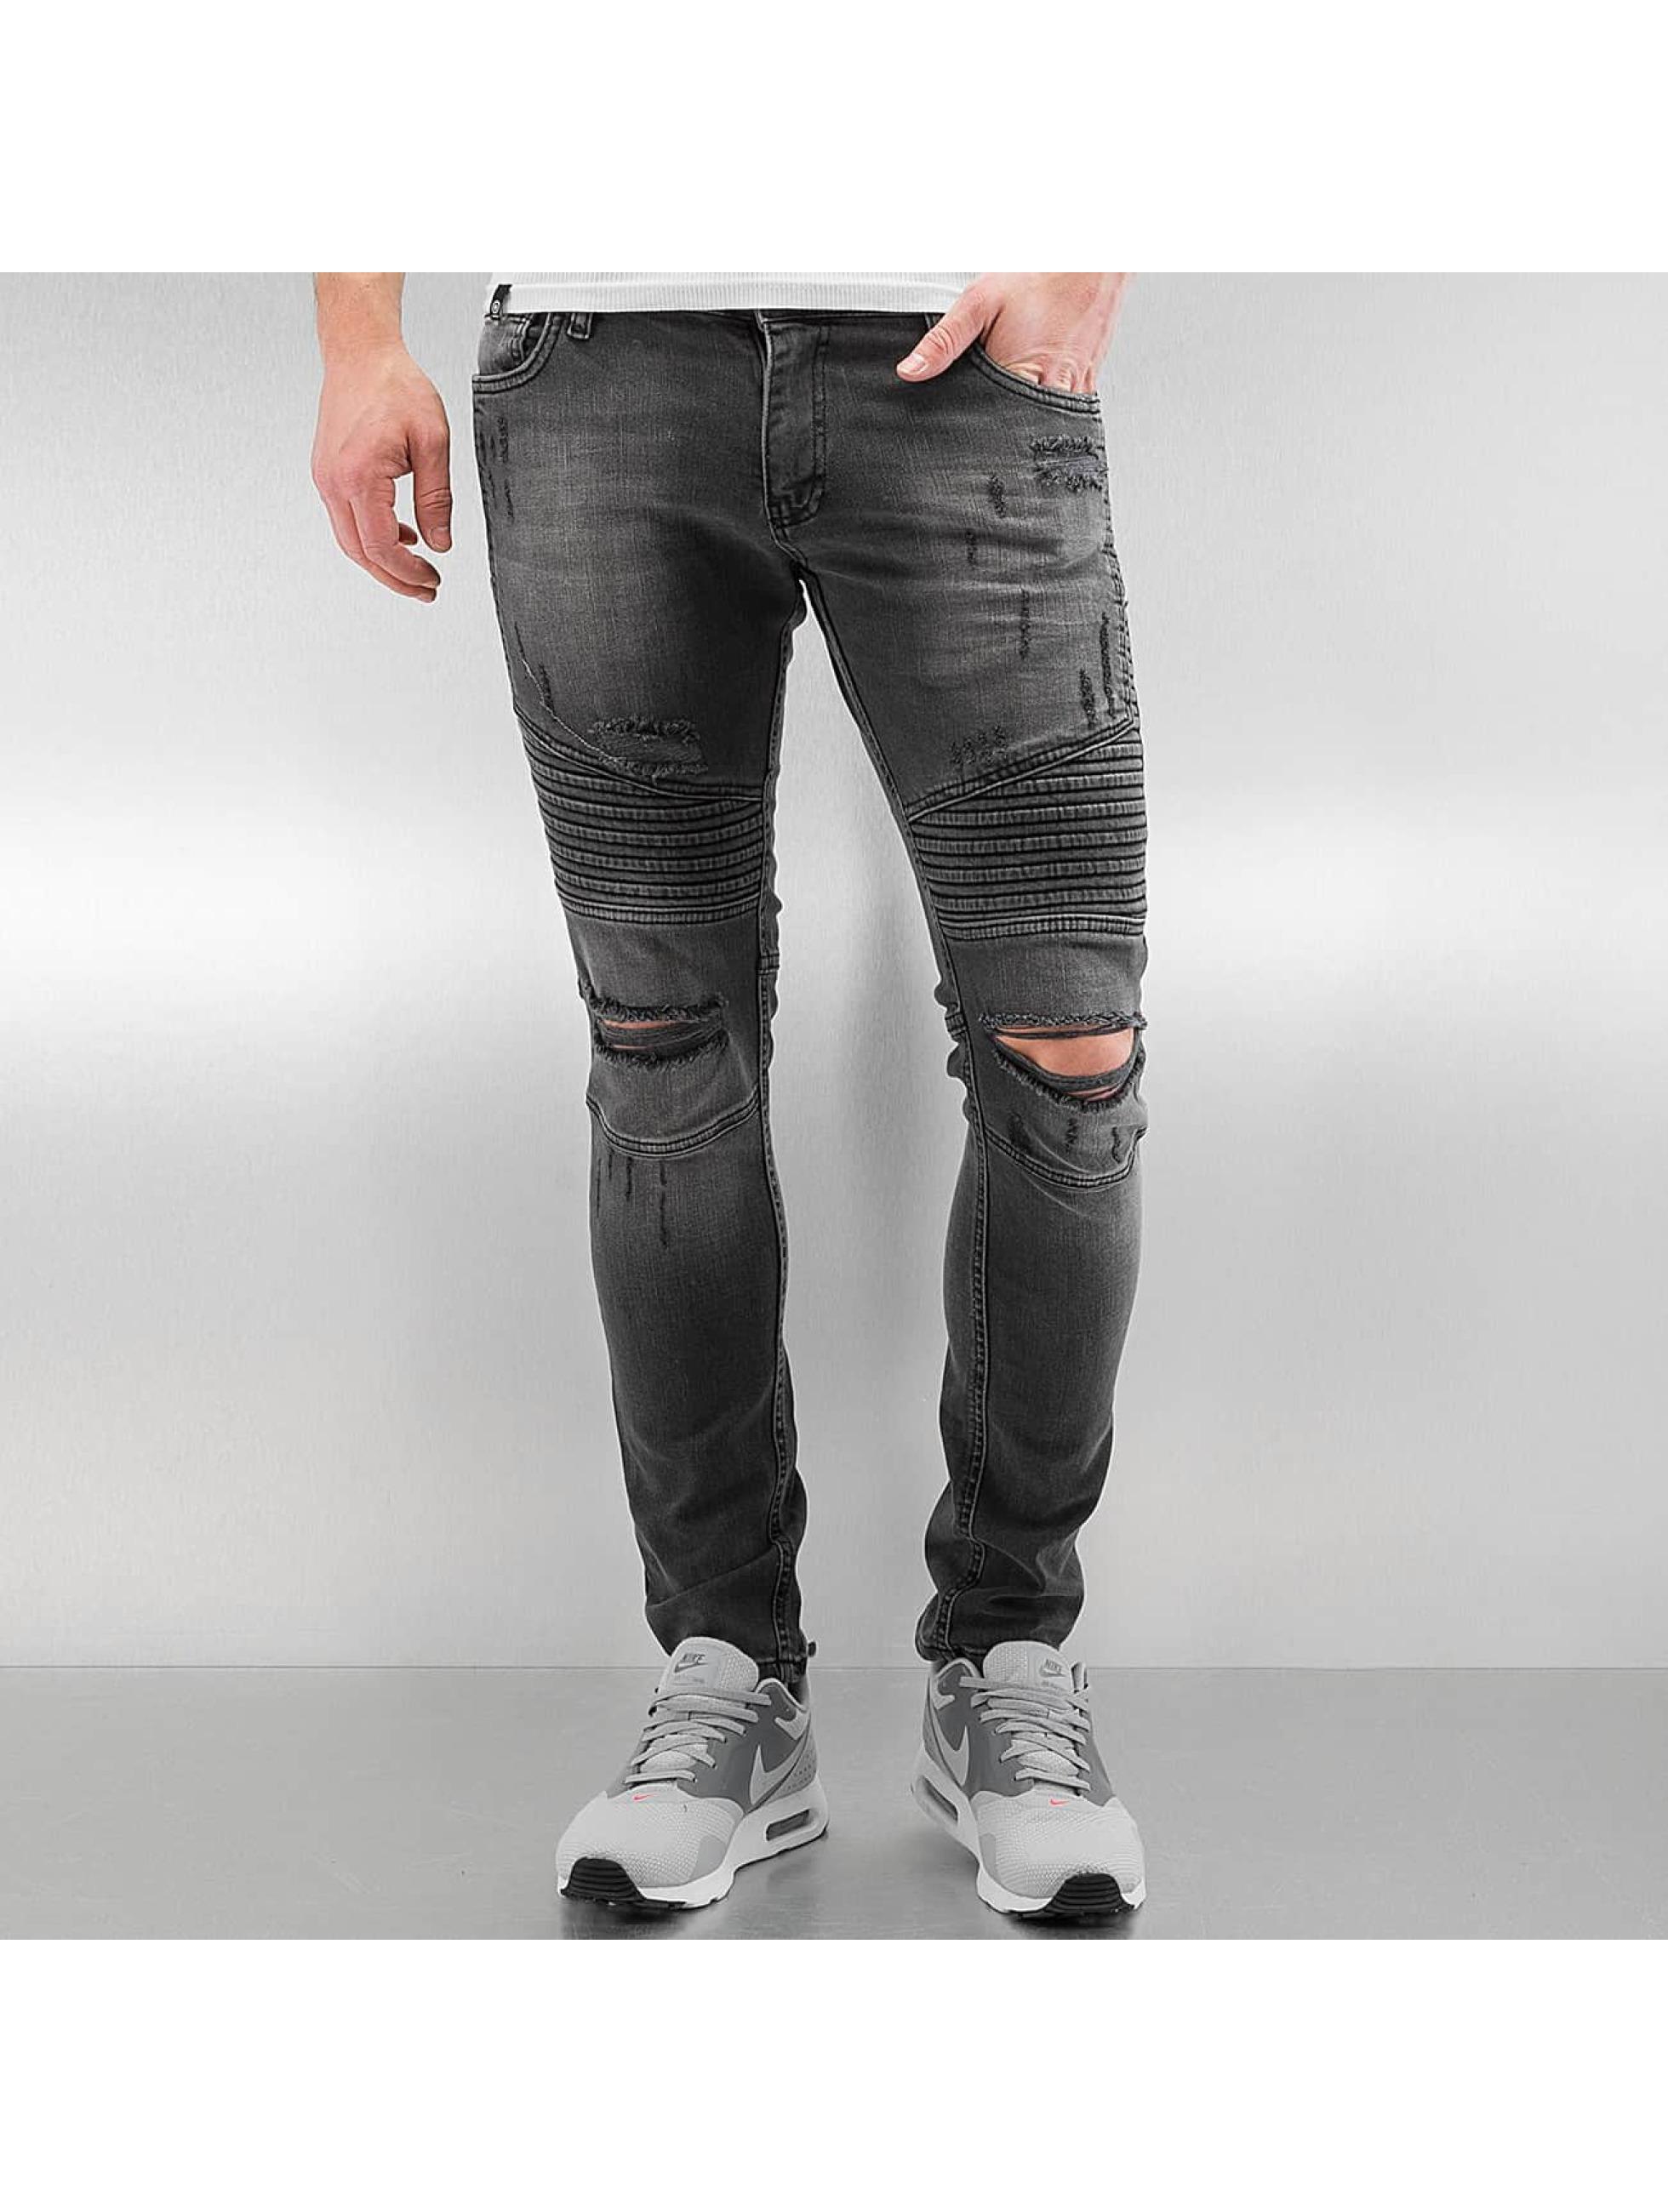 2Y / Skinny Jeans Grimsby in grey W 33